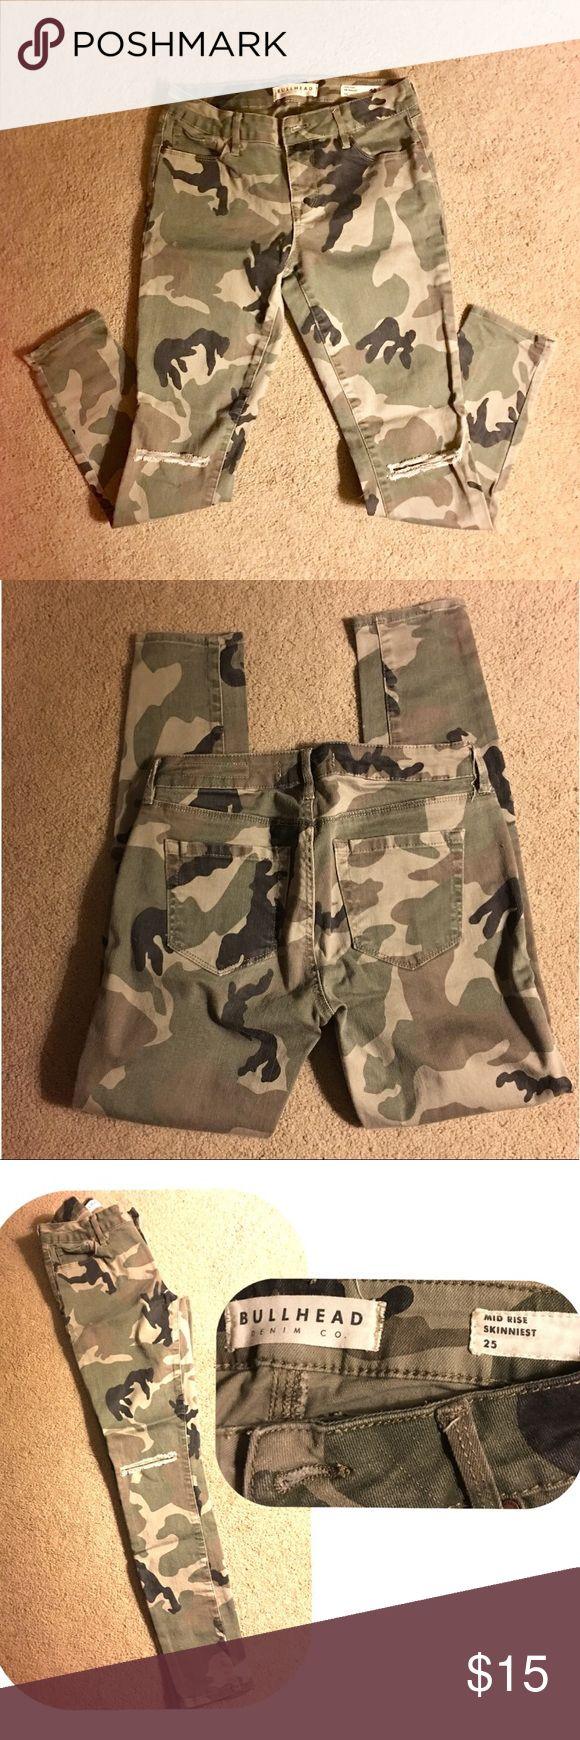 Camouflage skinny jeans Bullhead Skinny camo print jeans size 25 (waist)  with distressed slashed knees. Bullhead Jeans Skinny